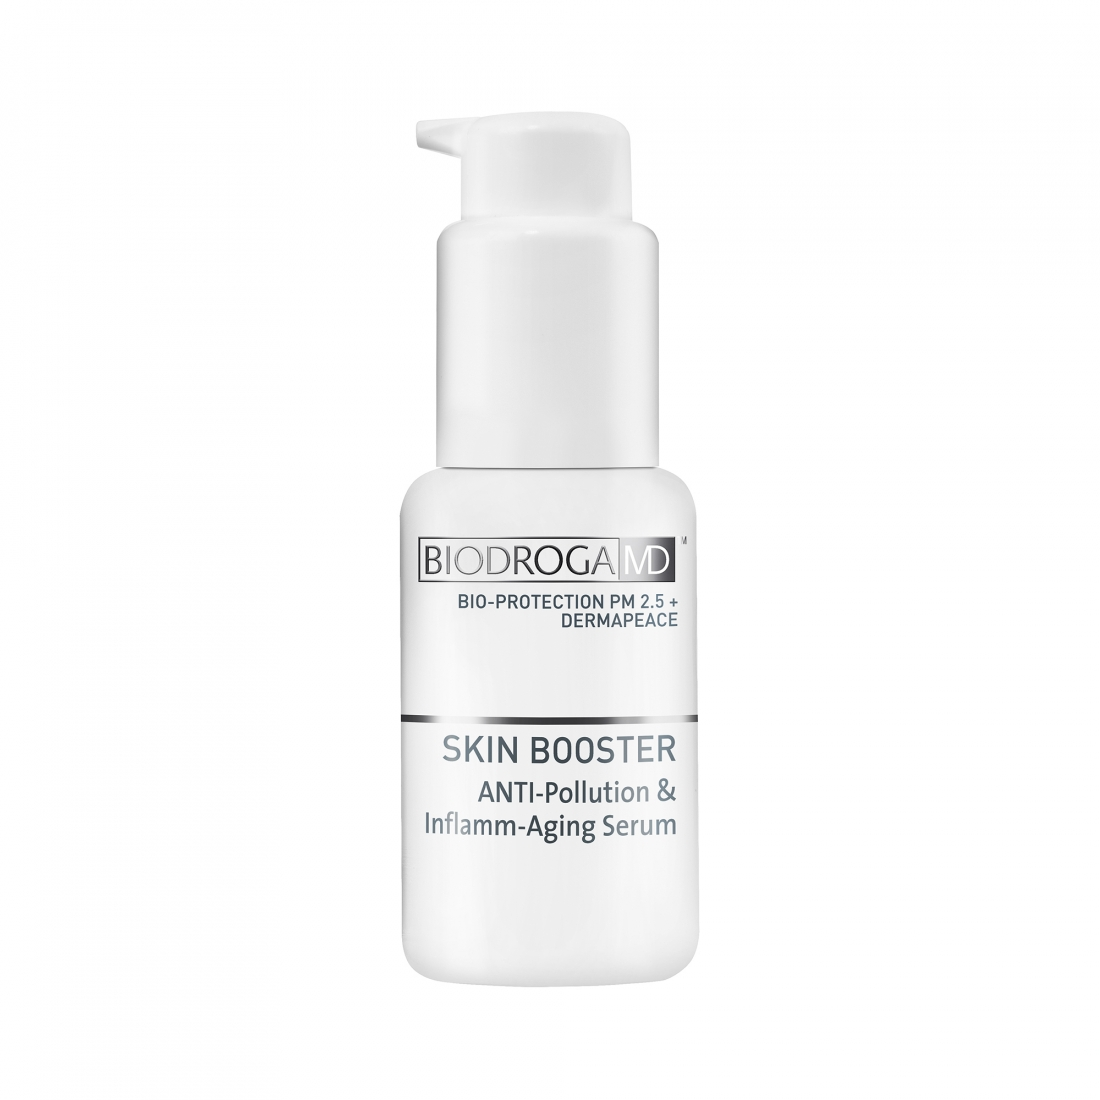 Biodroga_MD_Skin_booster_ANTI-pollution_Inflamm-aging-serum